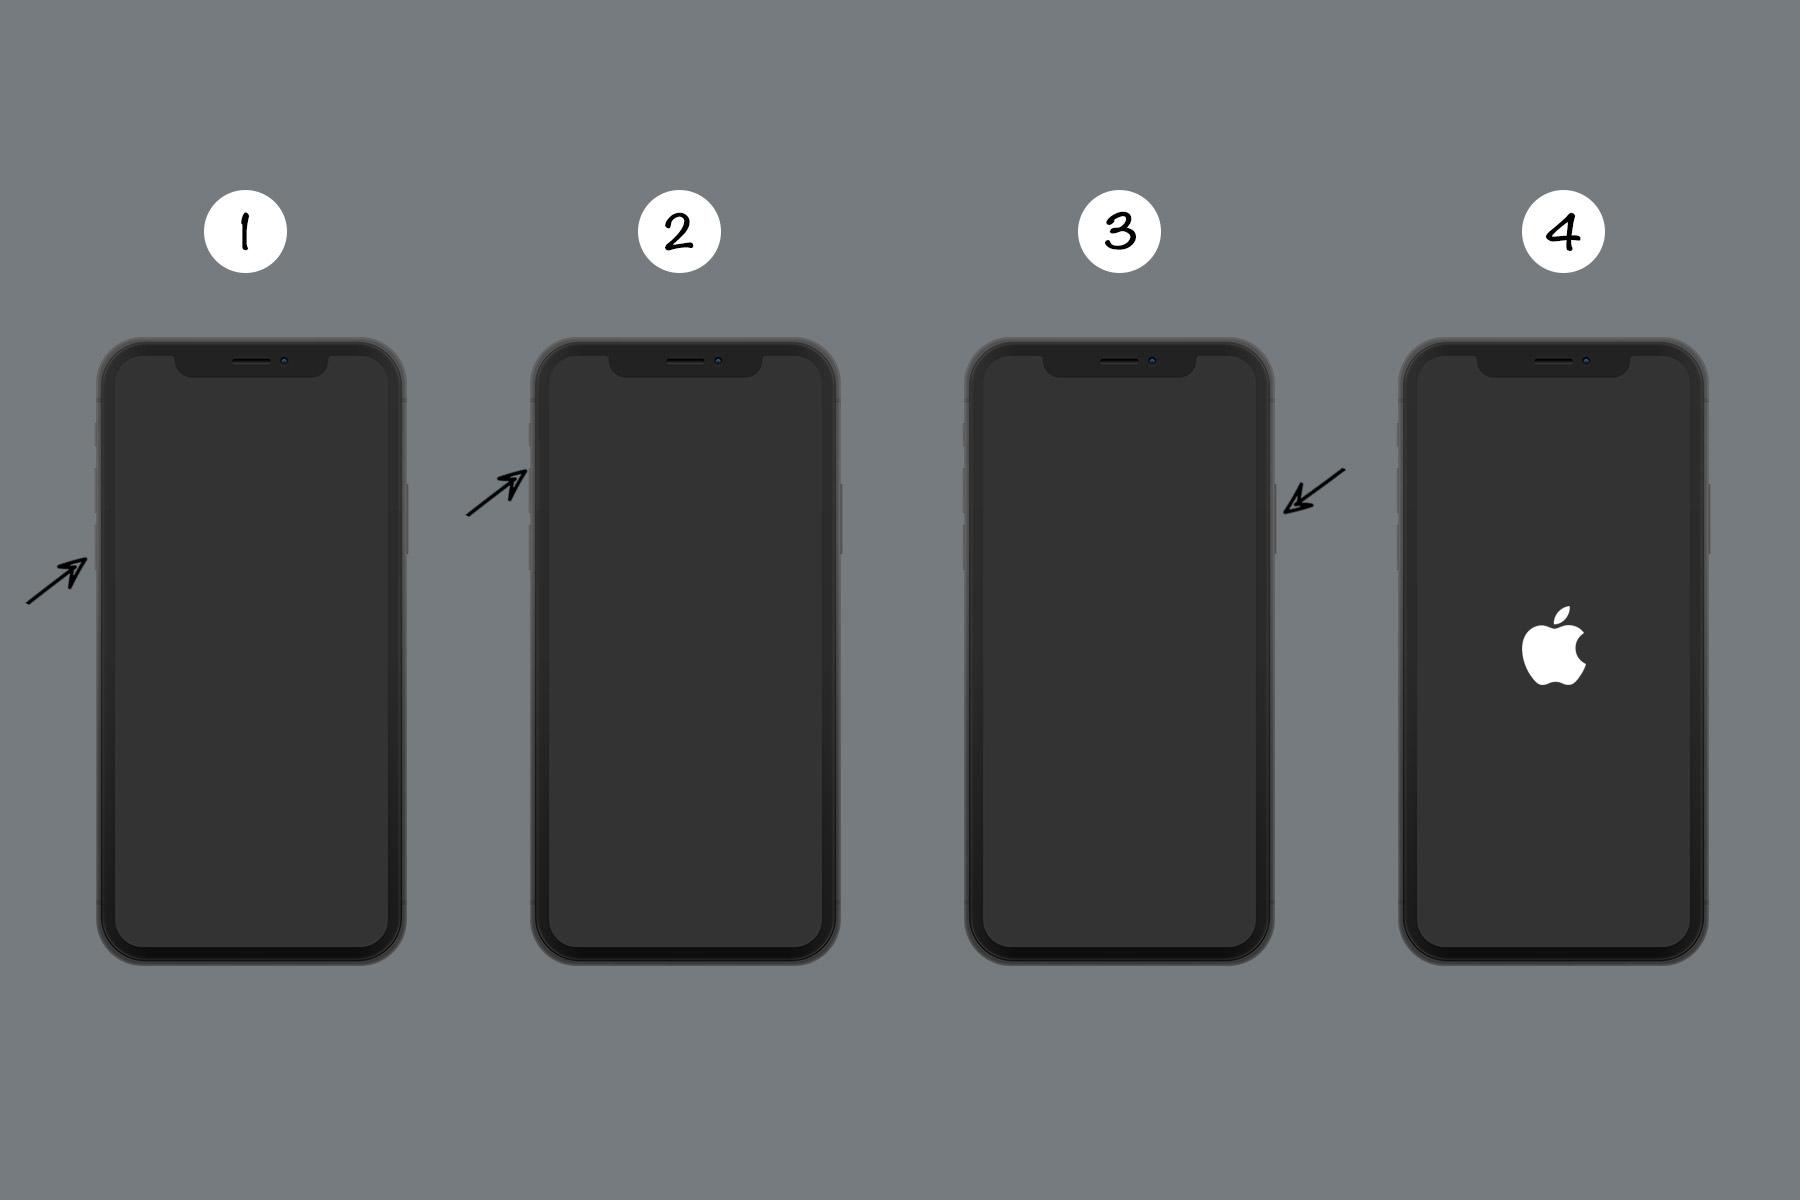 force restart iphone 8, iphone x